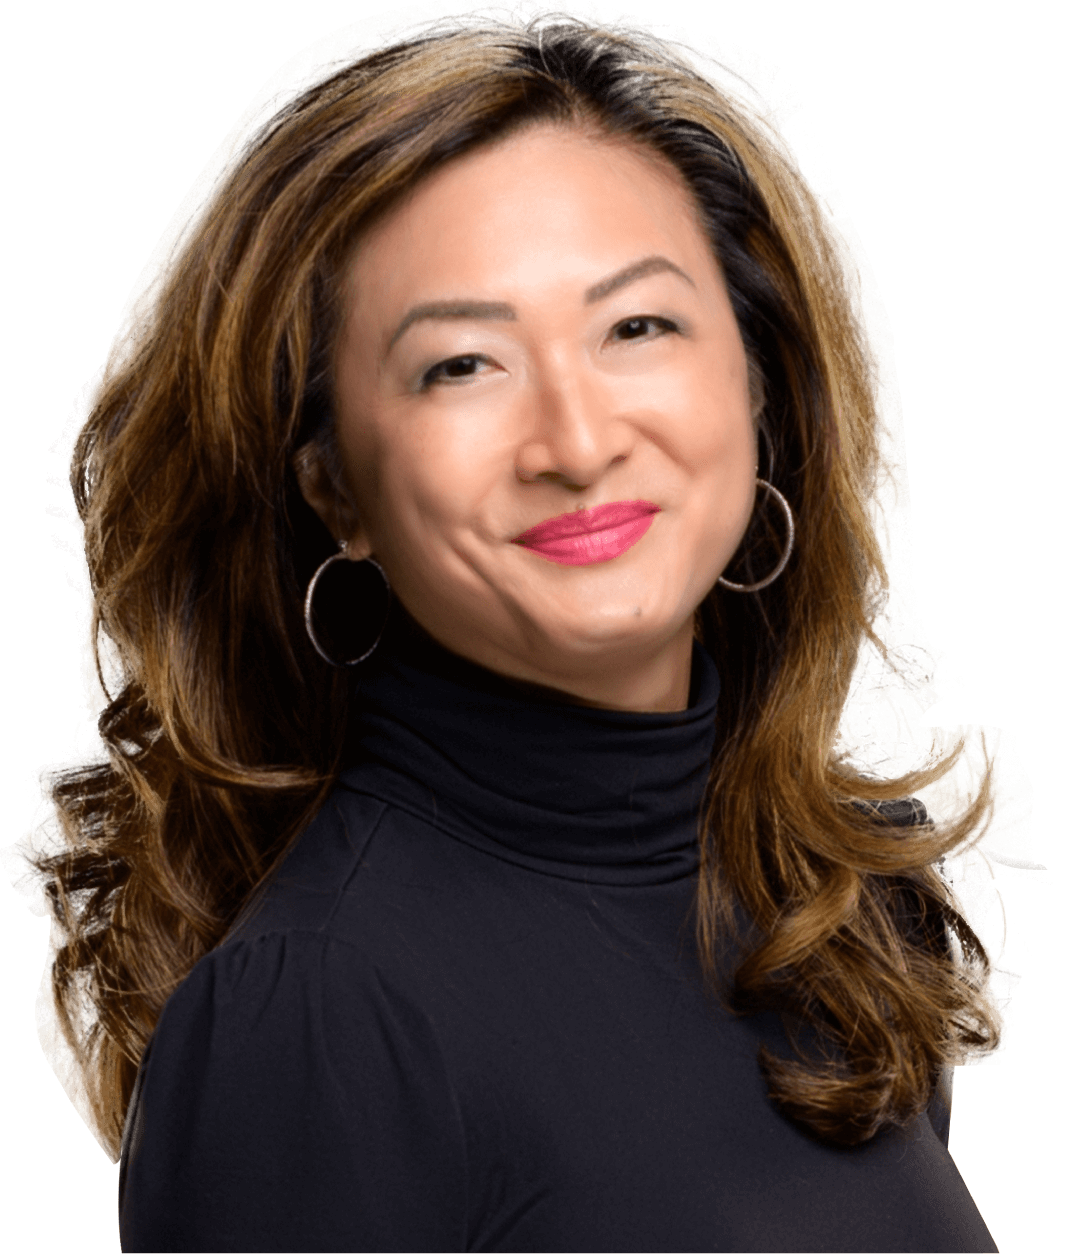 Theresa Bilingual Voice Actor Client Headshot